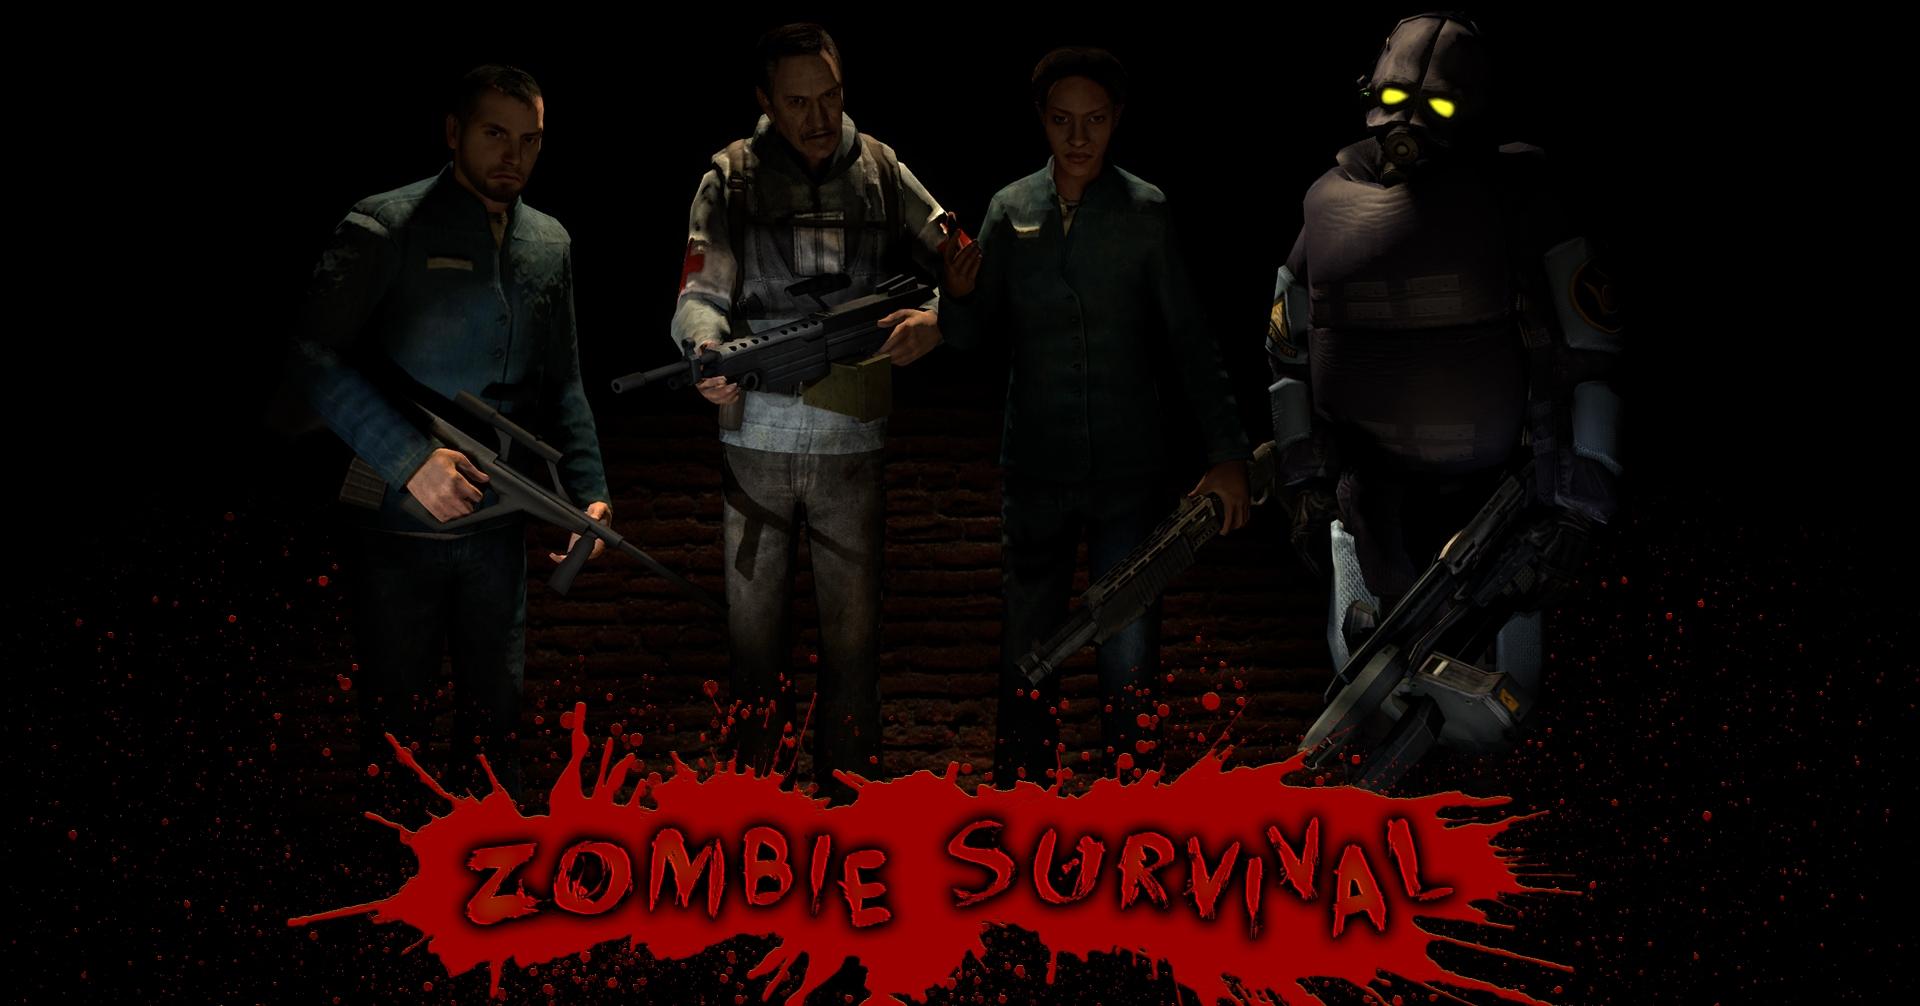 Steam Workshop :: Zombie Survival Maps on gmod zombies vs humans, gmod sniper, gmod godzilla survival, gmod dino survival, gmod nazi zombies,